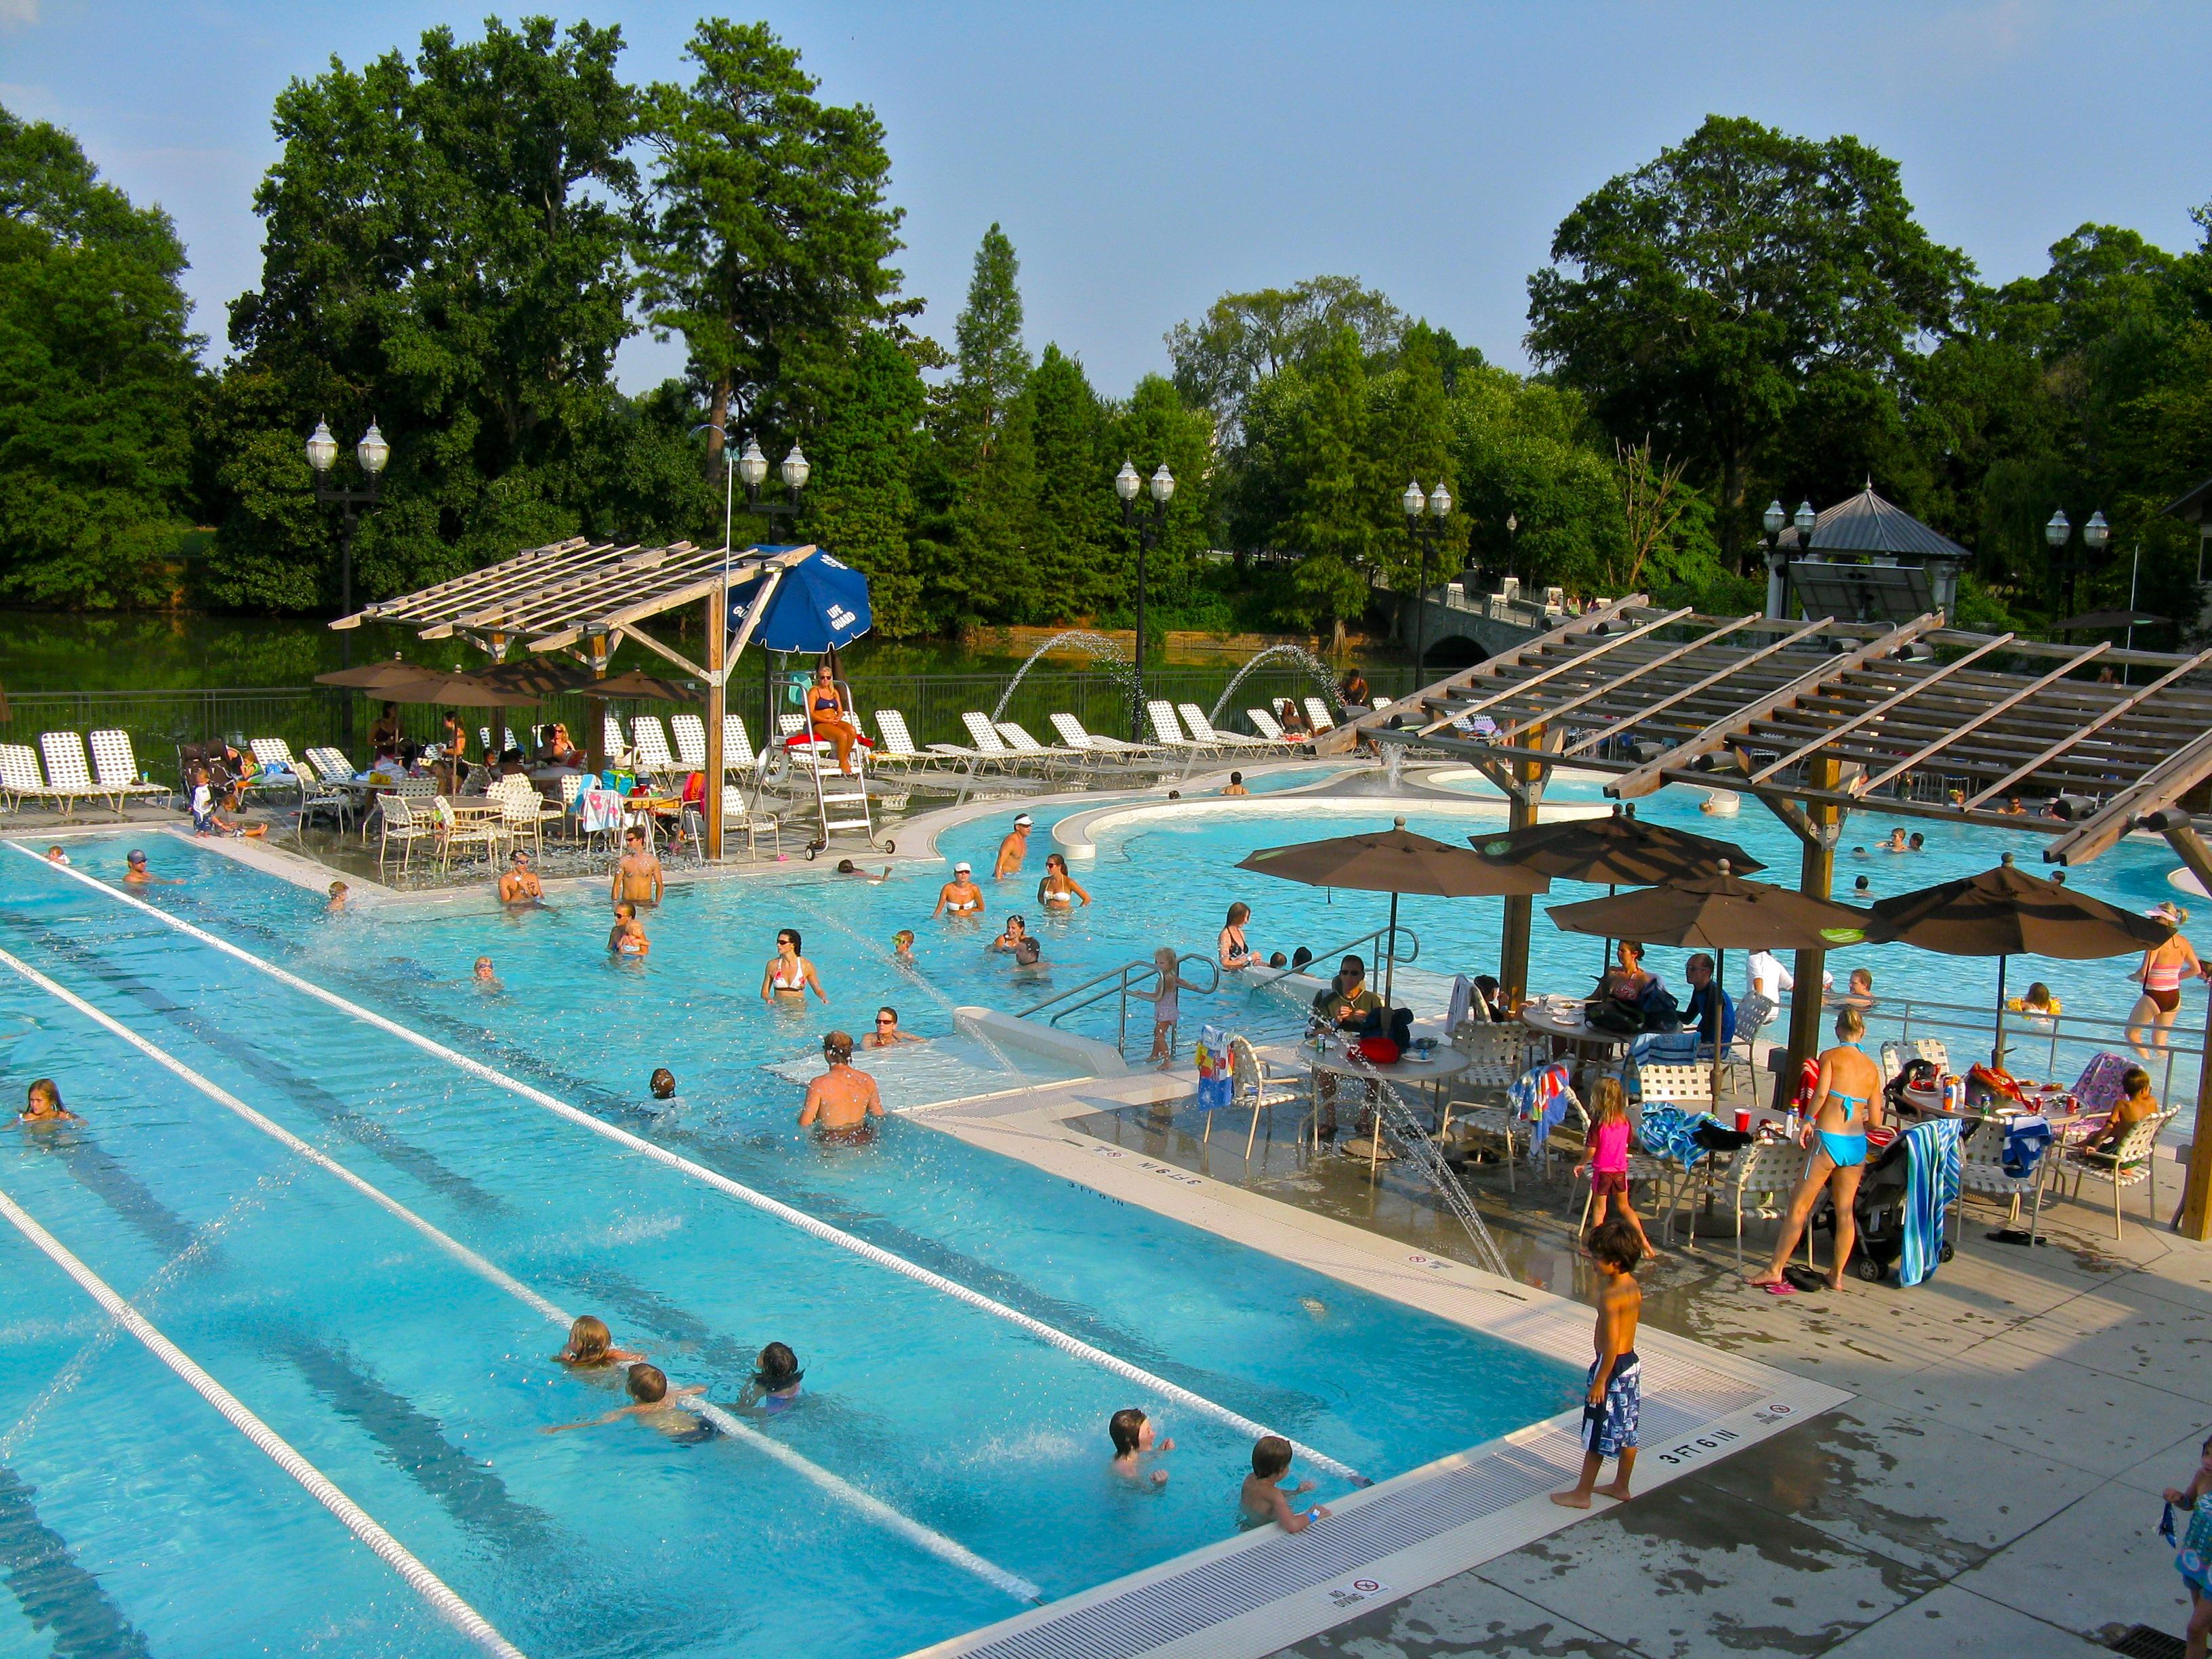 Pool Aquatic Center 72 dpi.JPG